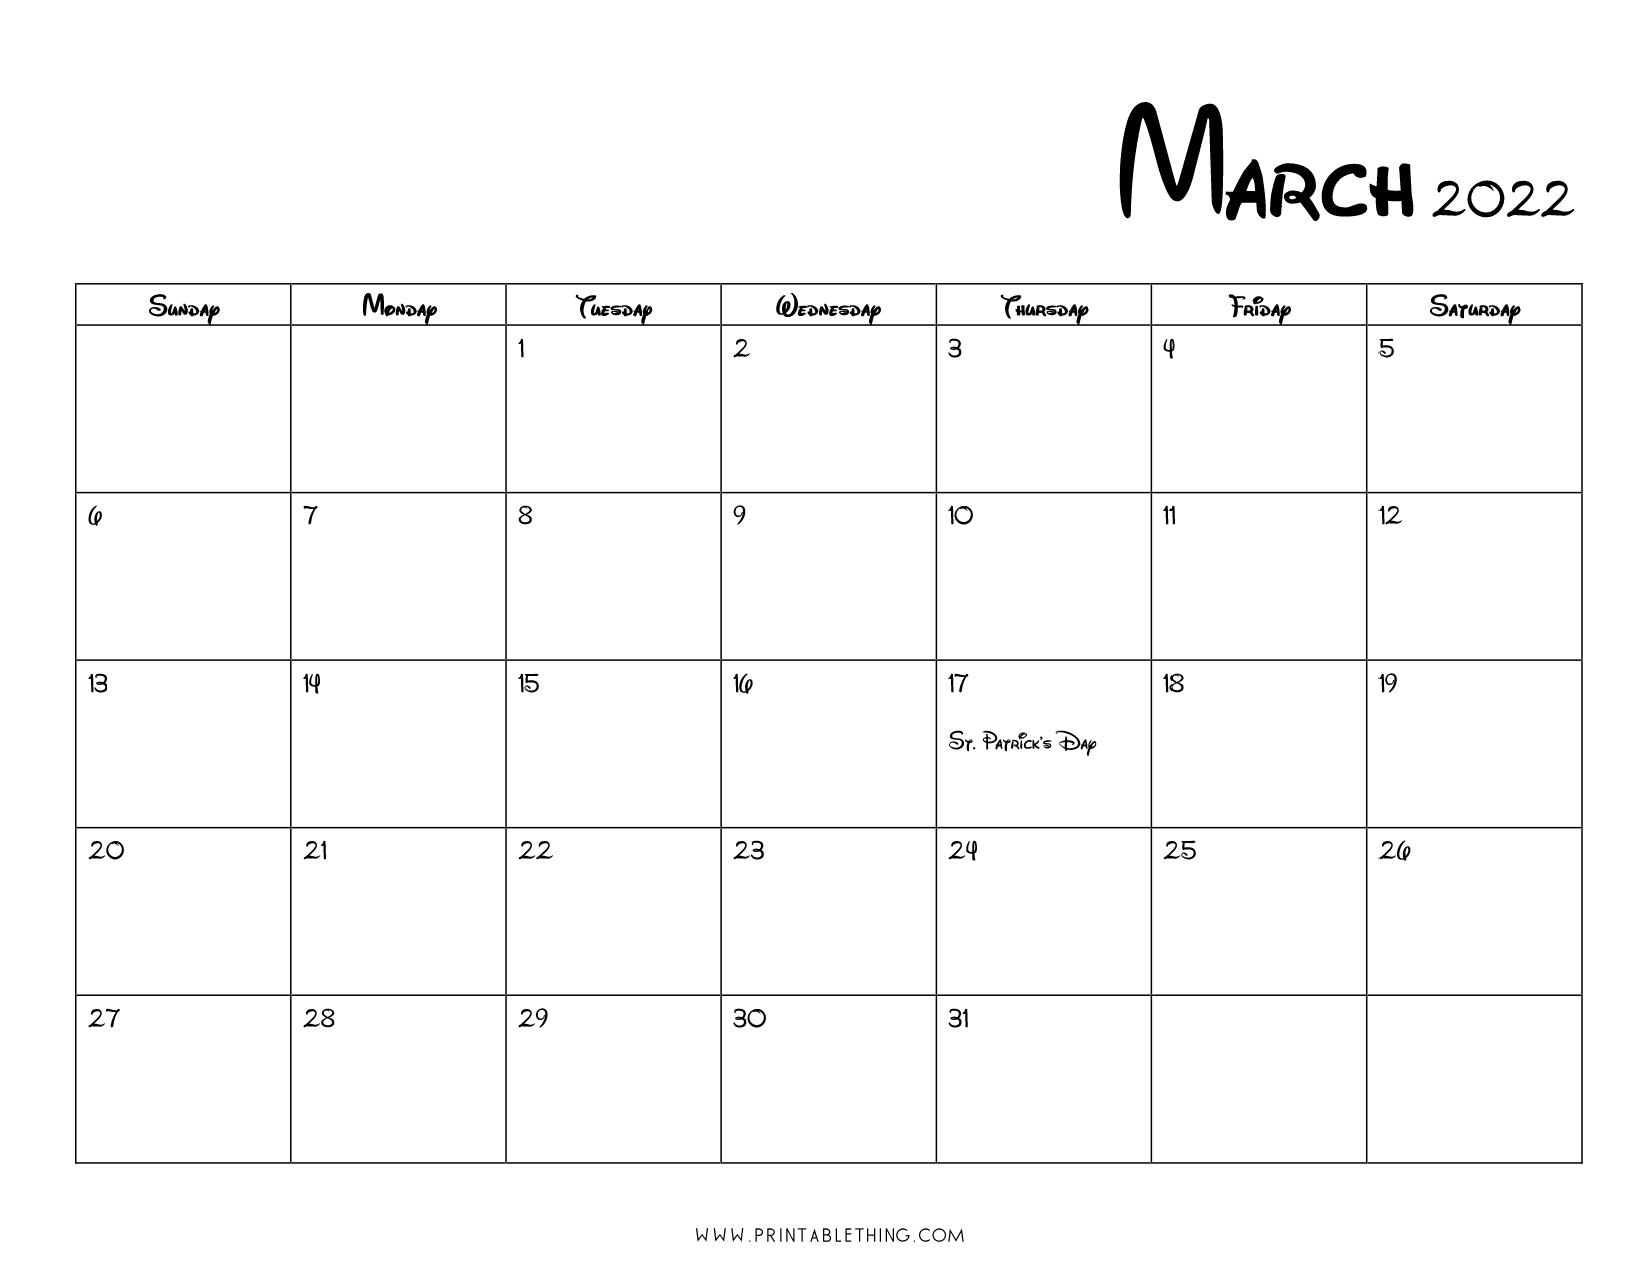 monthly calendar 2022, printable calendar 2022 paper orientation: 20+ March 2022 Calendar | Printable, PDF, US Holidays ...